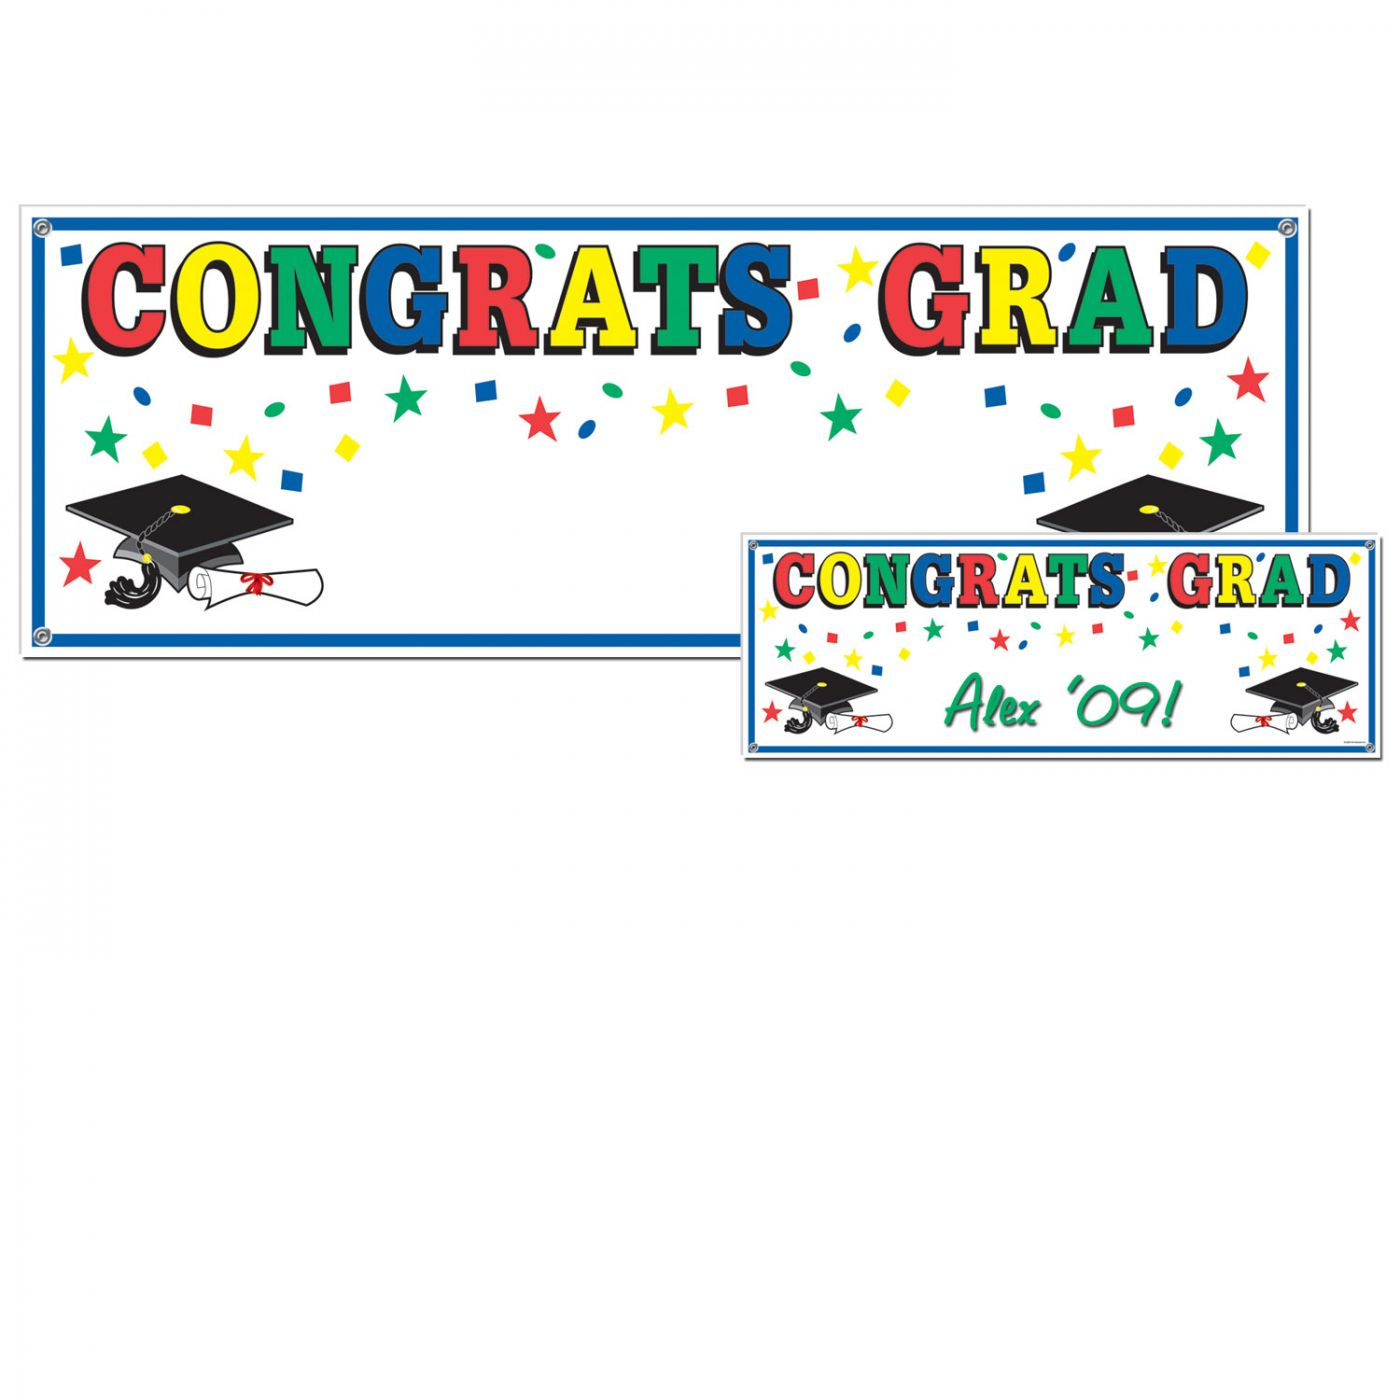 Congrats Grad Sign Banner image